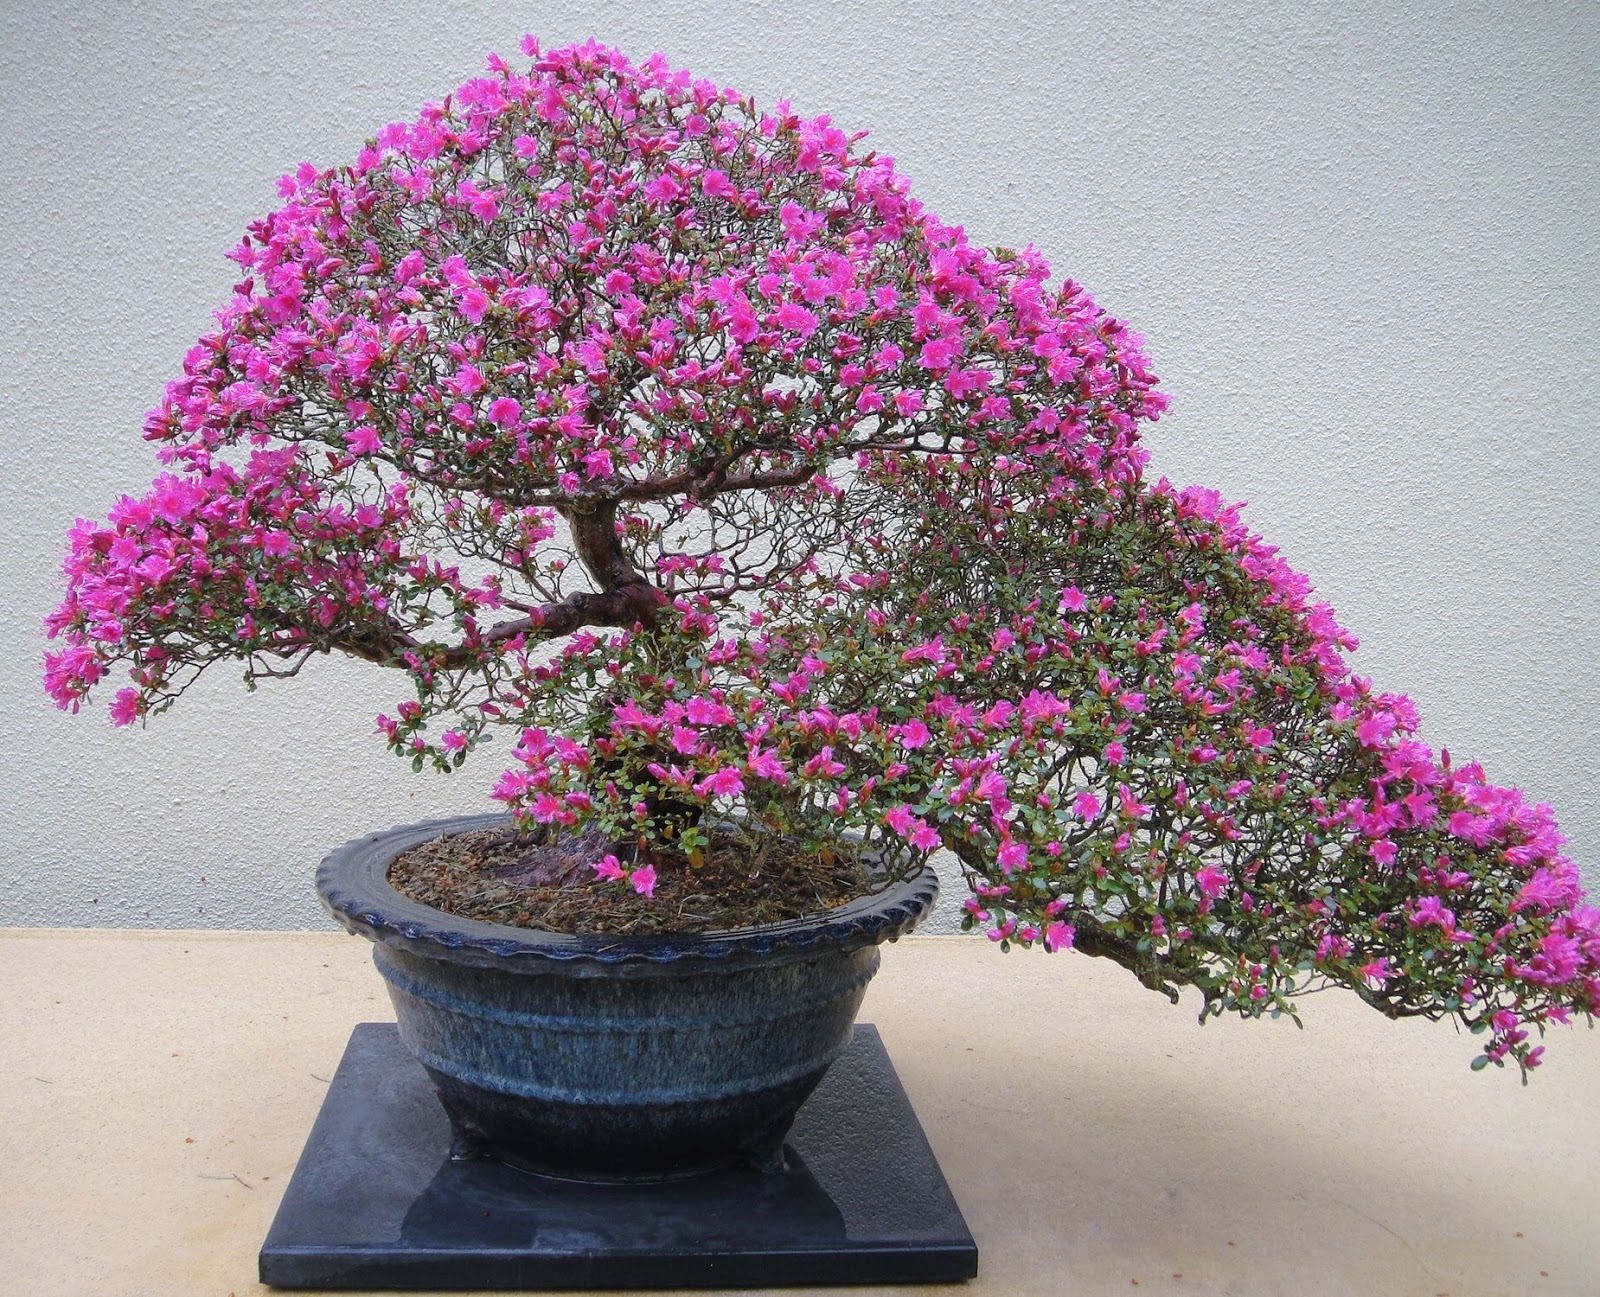 Gardenenvy bonsai in seattle small trees big impact for Azalea bonsai